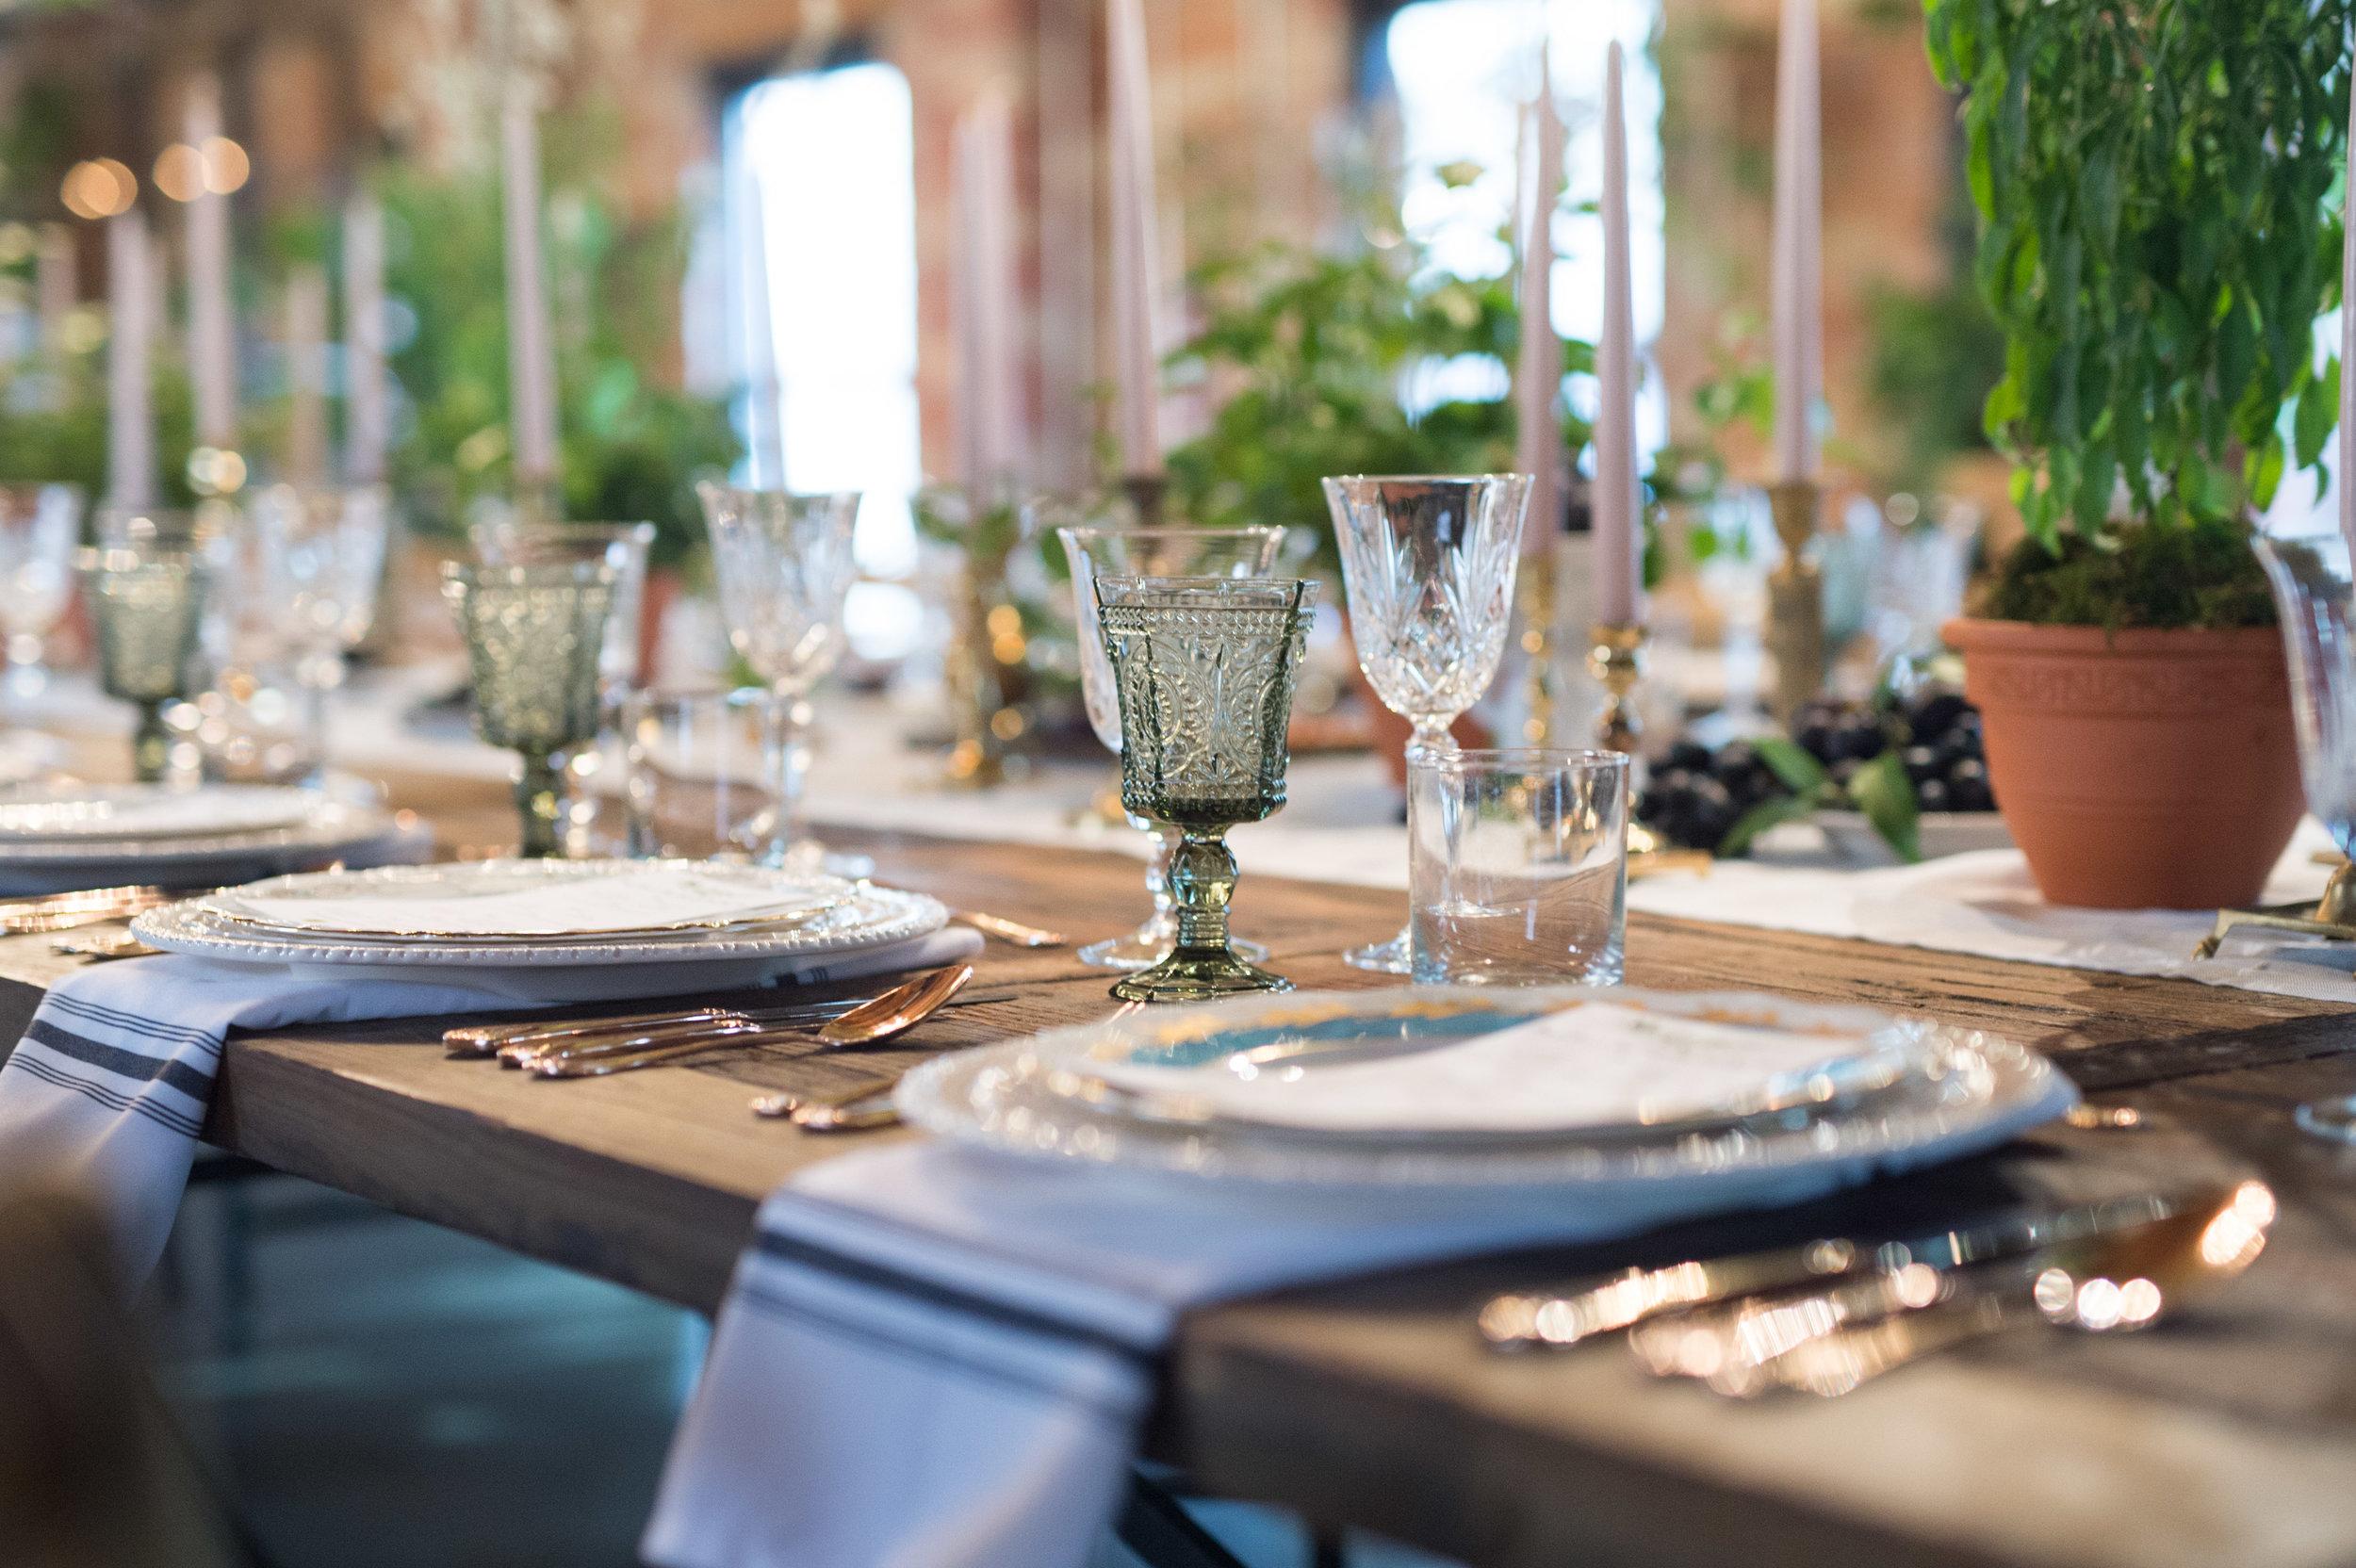 Best-Buy-Dinner-with-David-Rocco-286.jpg